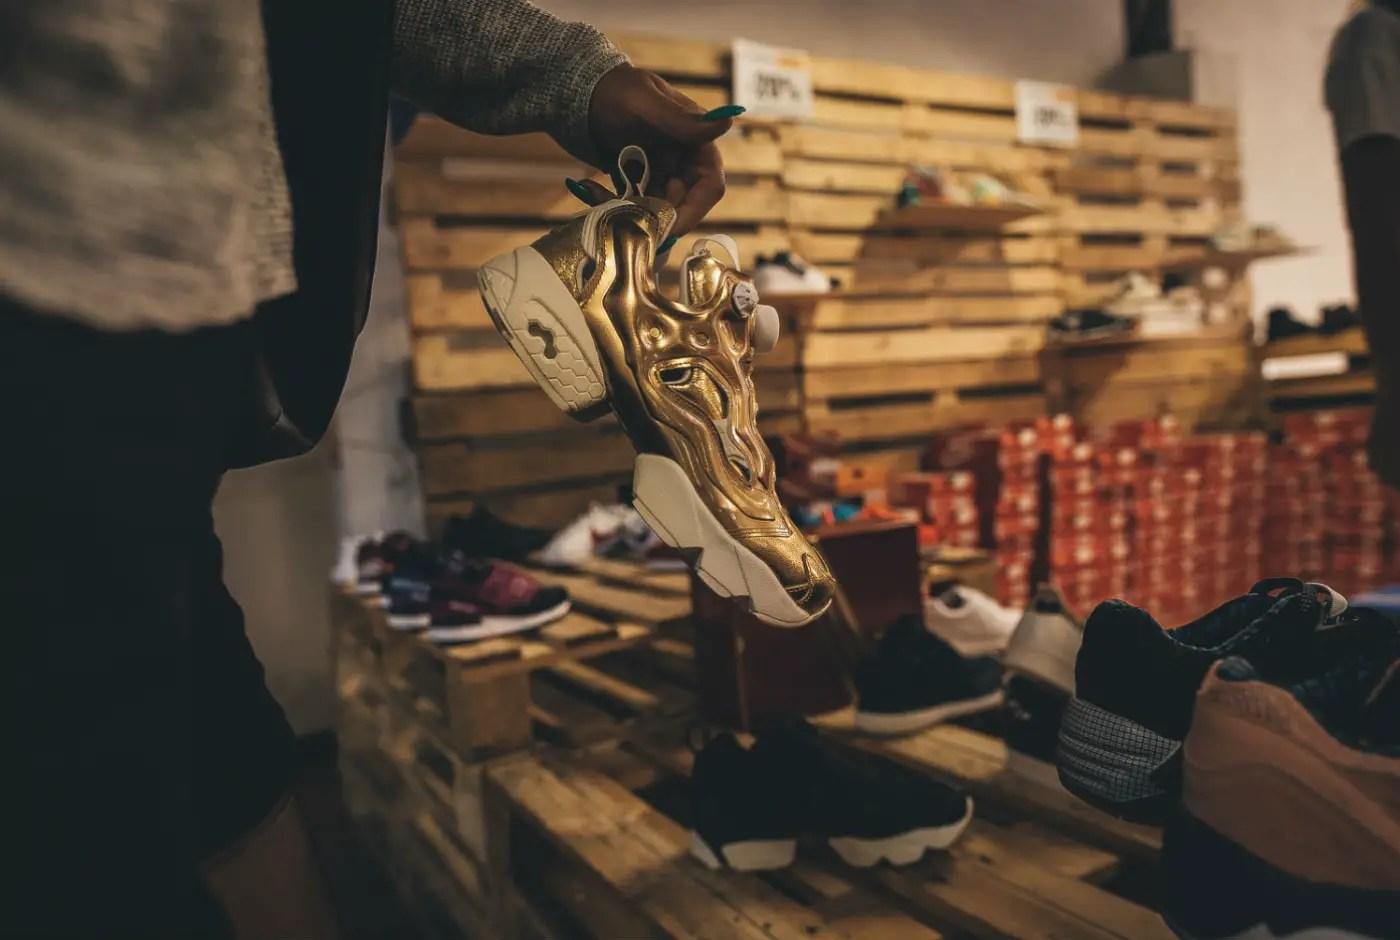 sneakers-love-portugal-2016-010